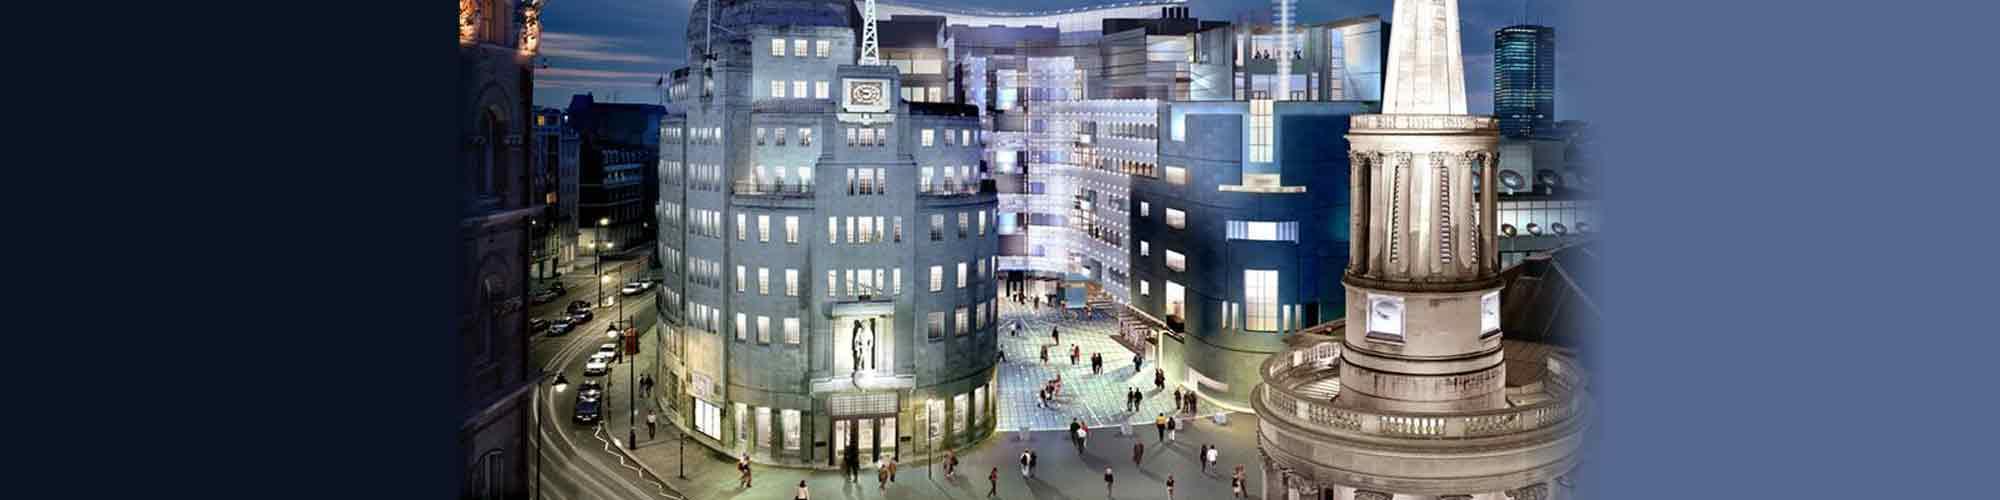 night-time view of BBC studios, London